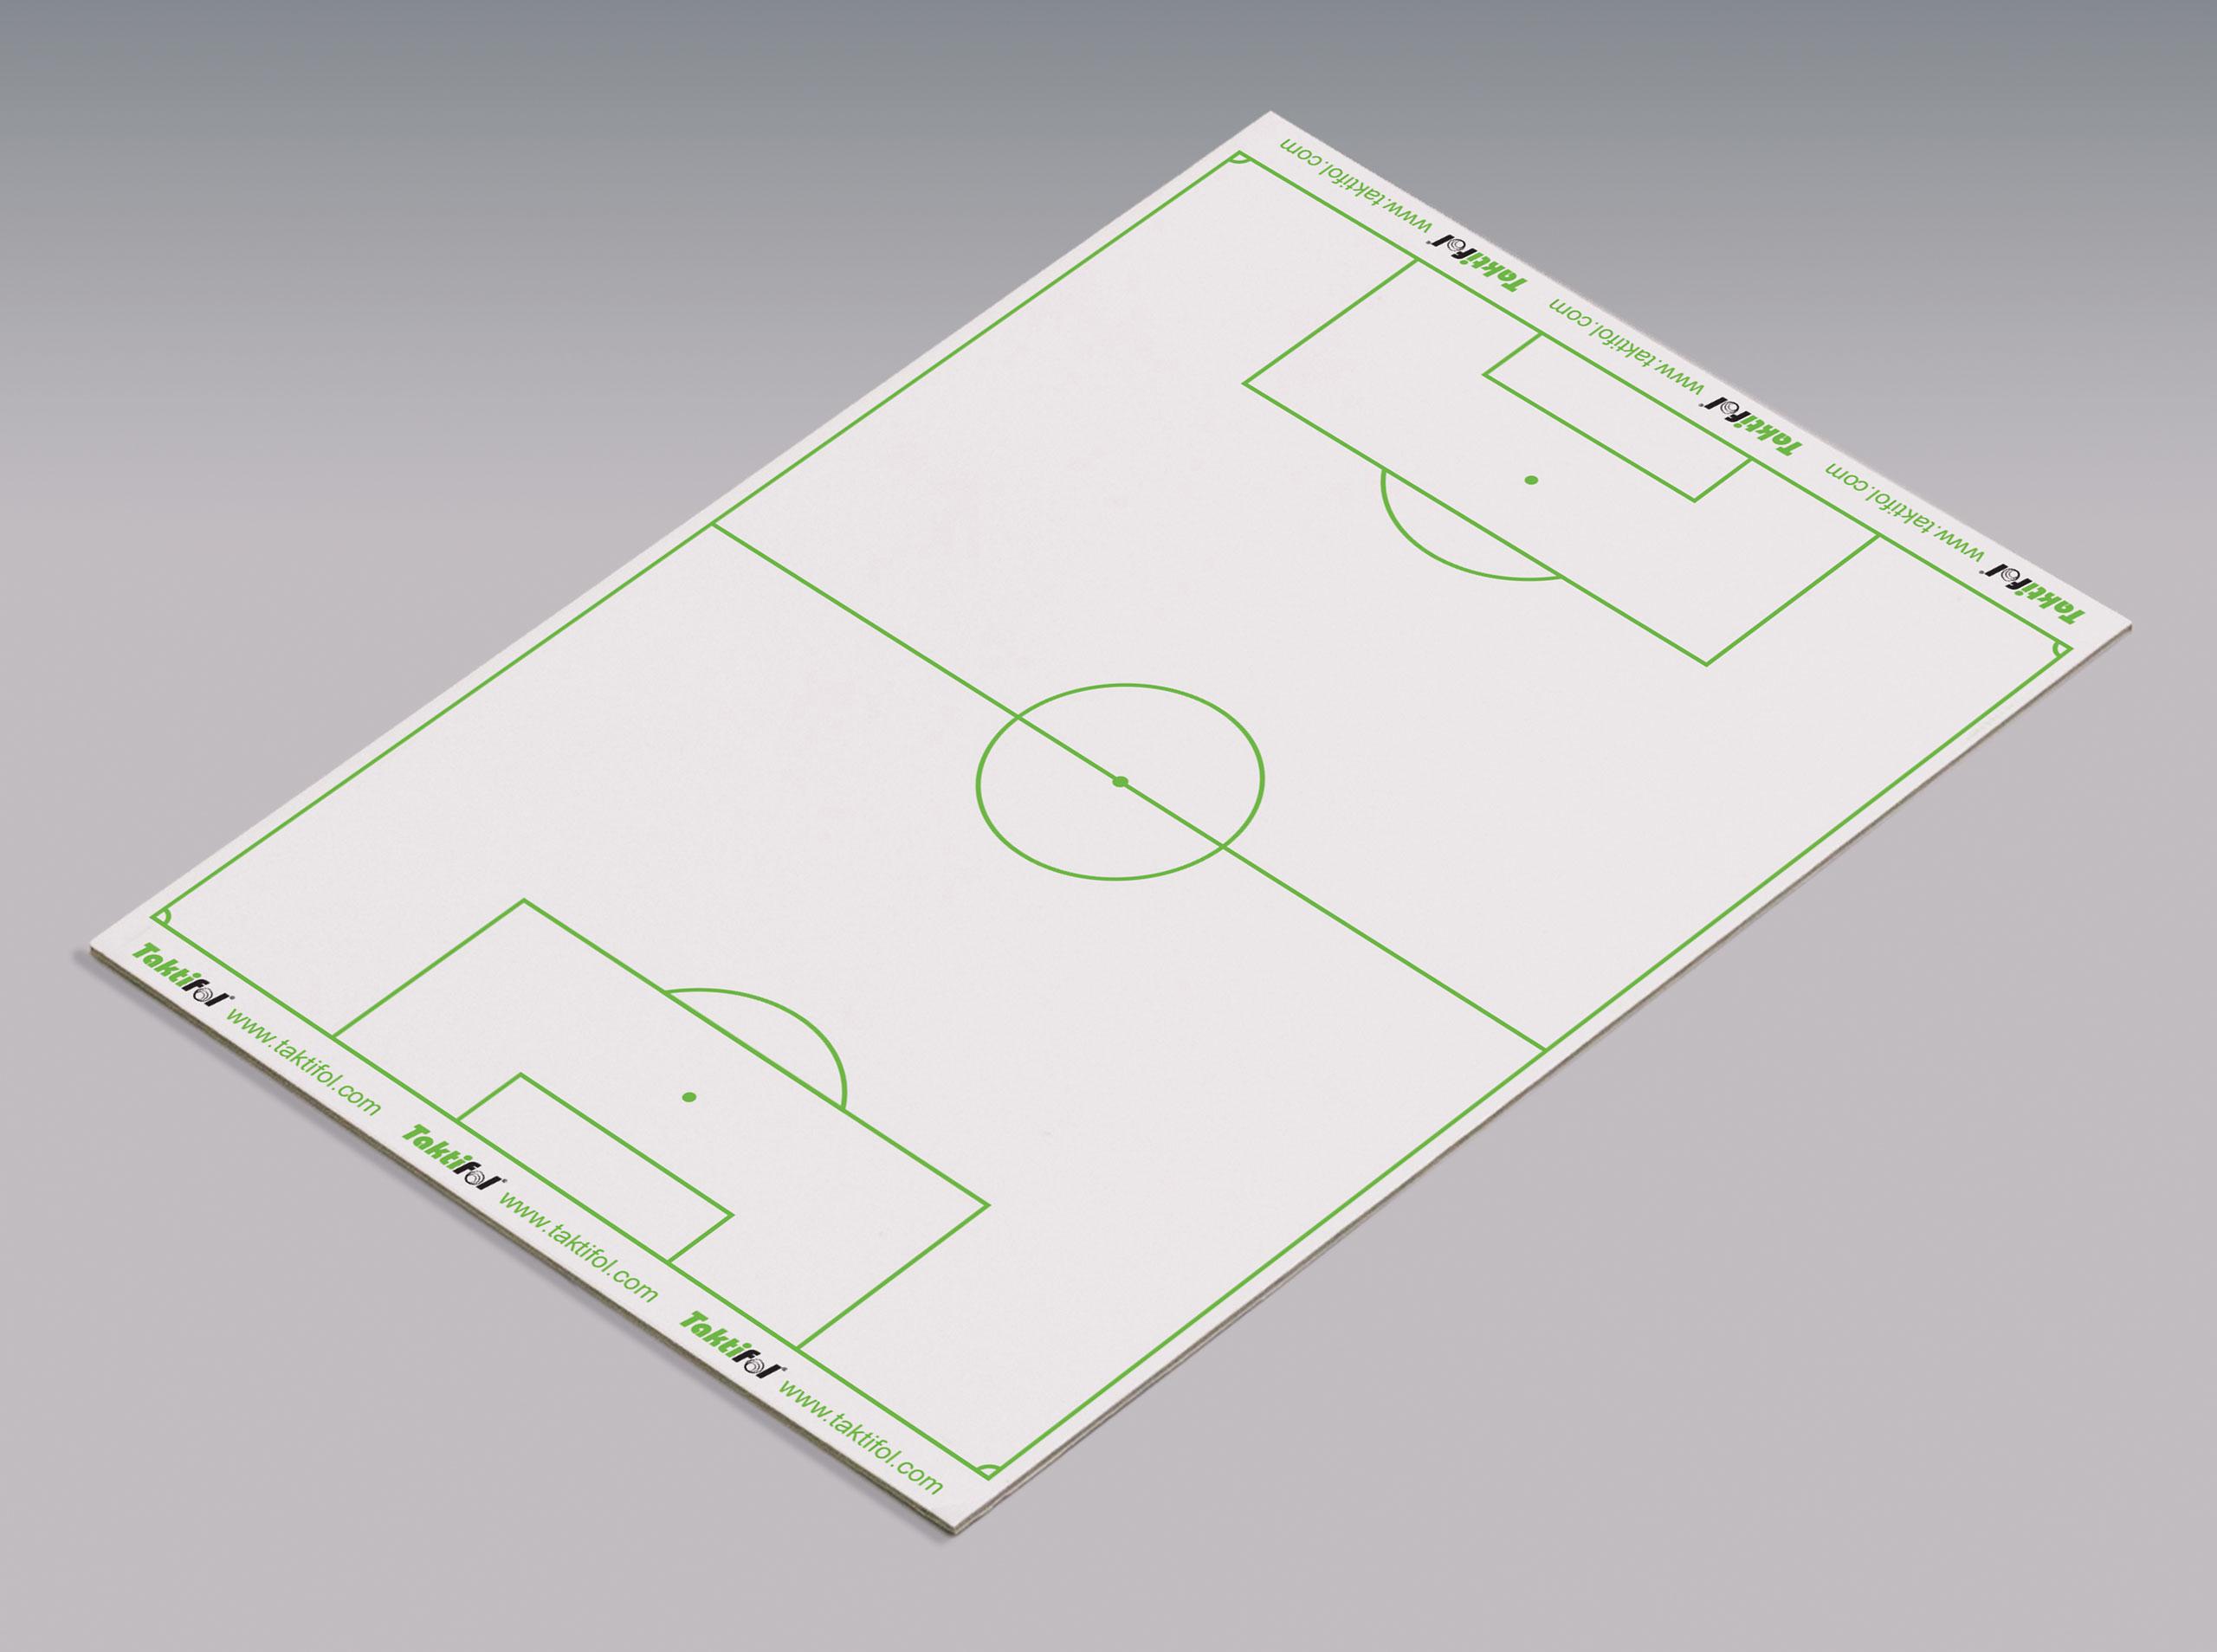 Taktiboard Soccer